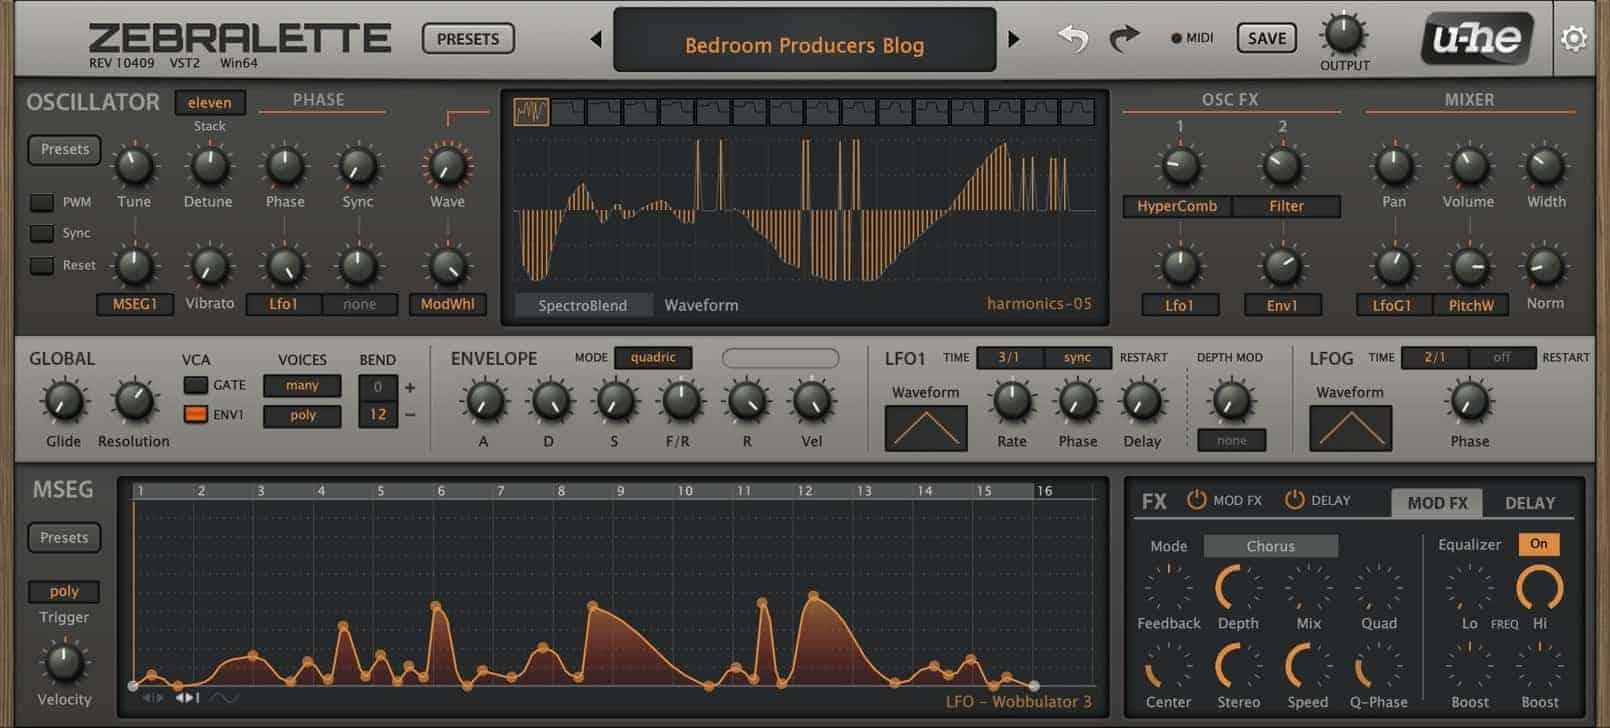 Zebralette by U-He - Free Synth VST Plugin